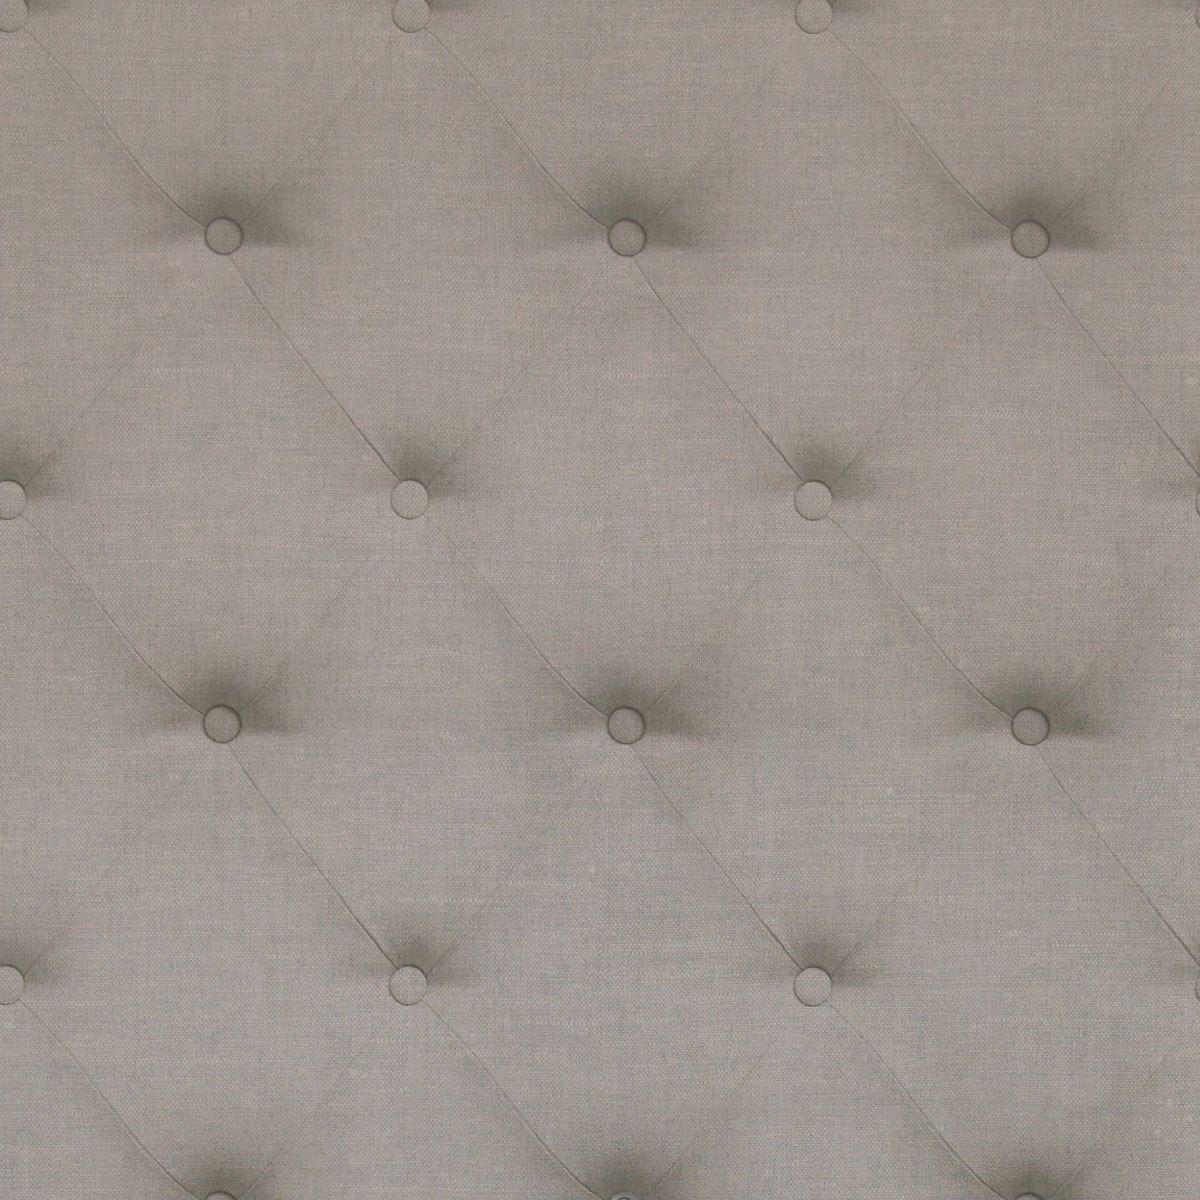 hochwertige tapeten und stoffe b n wallcoverings vliestapete riviera maison 18371 decowunder. Black Bedroom Furniture Sets. Home Design Ideas